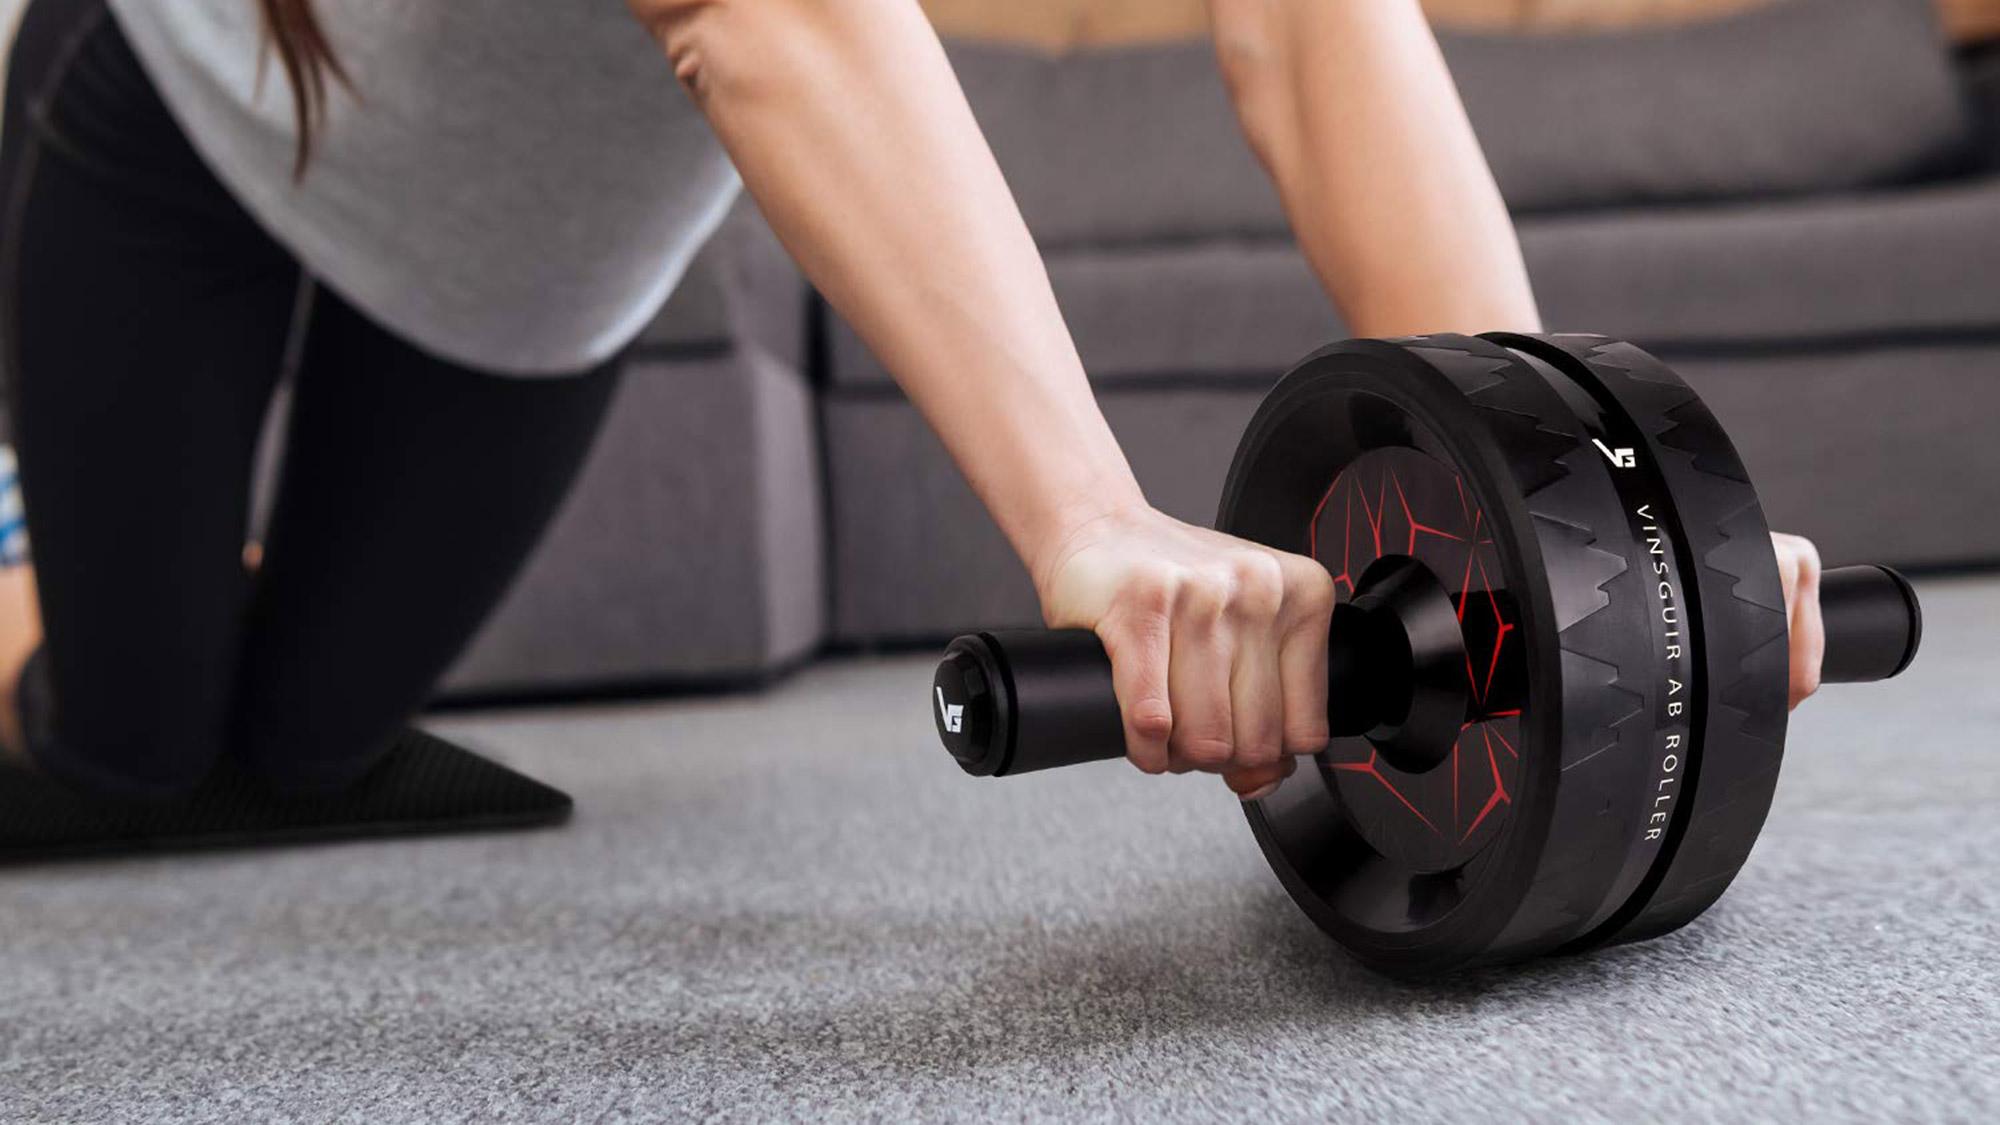 Best home gym equipment: Vinsguir Ab Roller